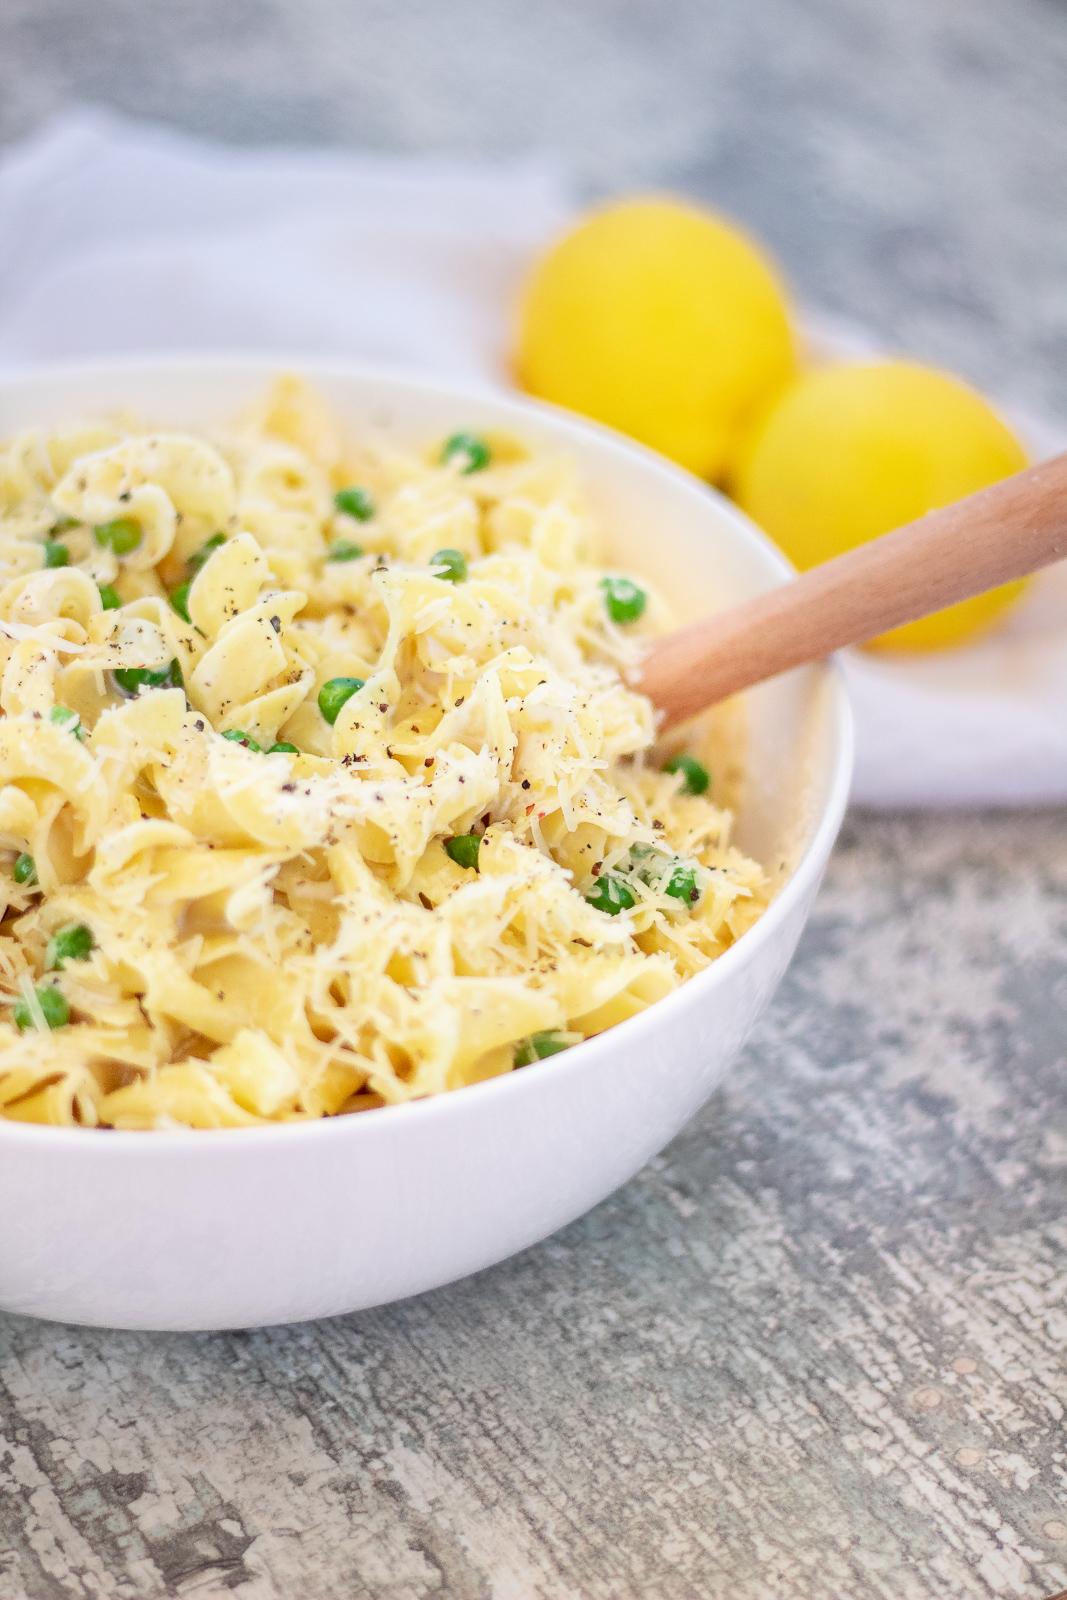 Creamy Lemon Pasta with green peas